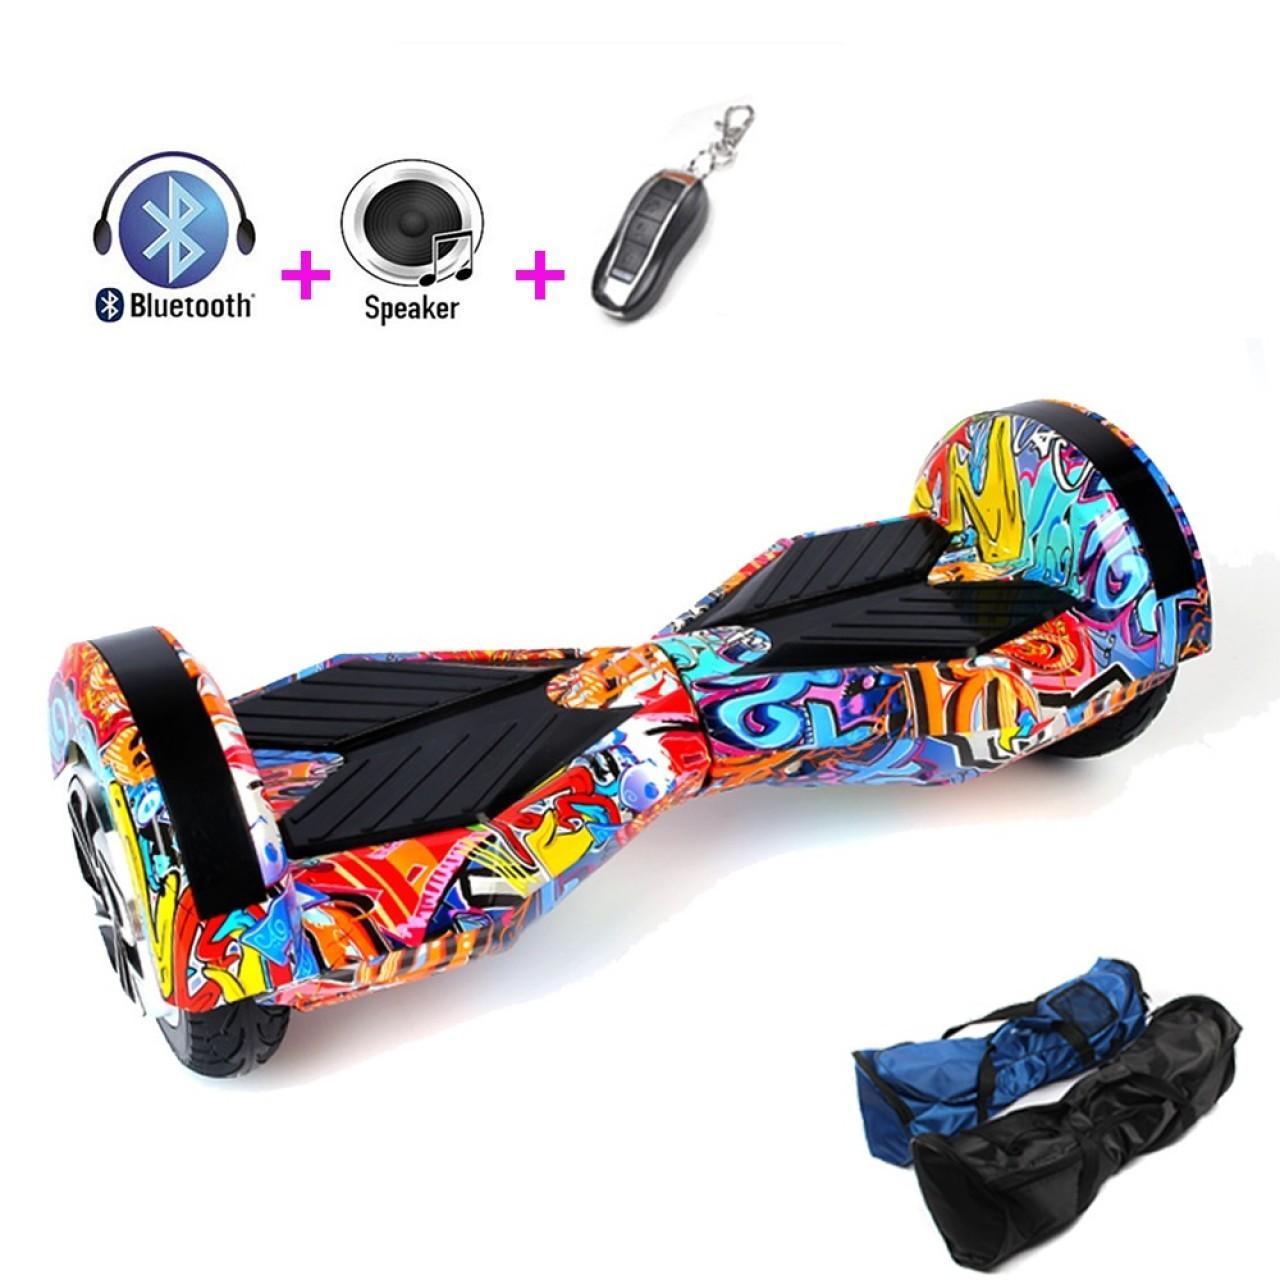 Електрически скейтборд с Bluetooth аудио система iOS и Android 6